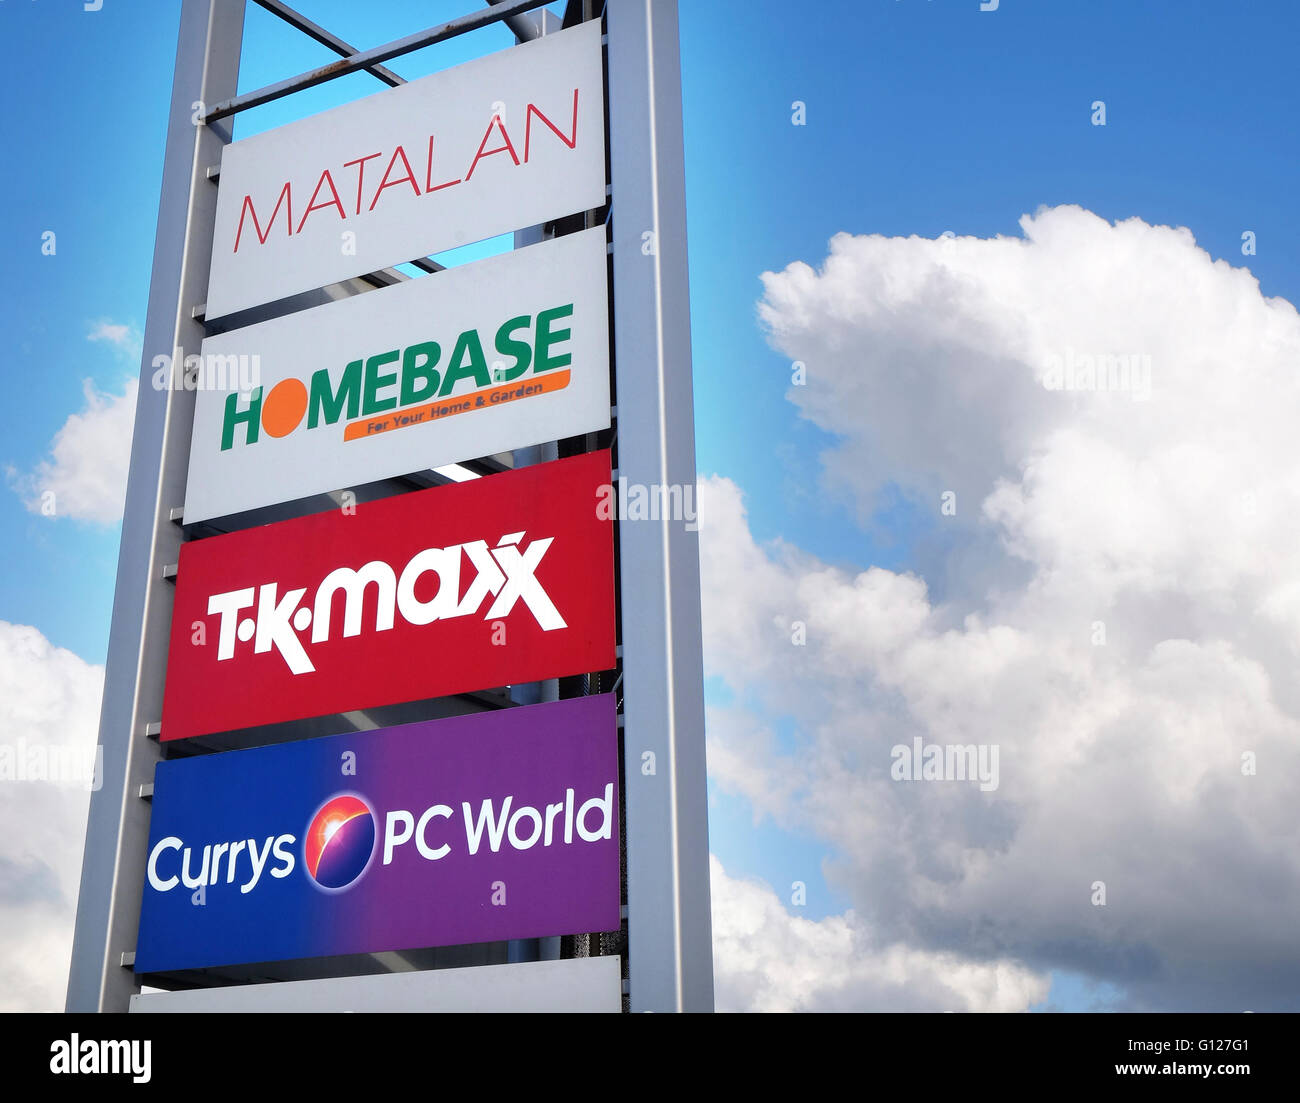 Retail Park advertising, Grantham, Lincolnshire, England, UK - Stock Image